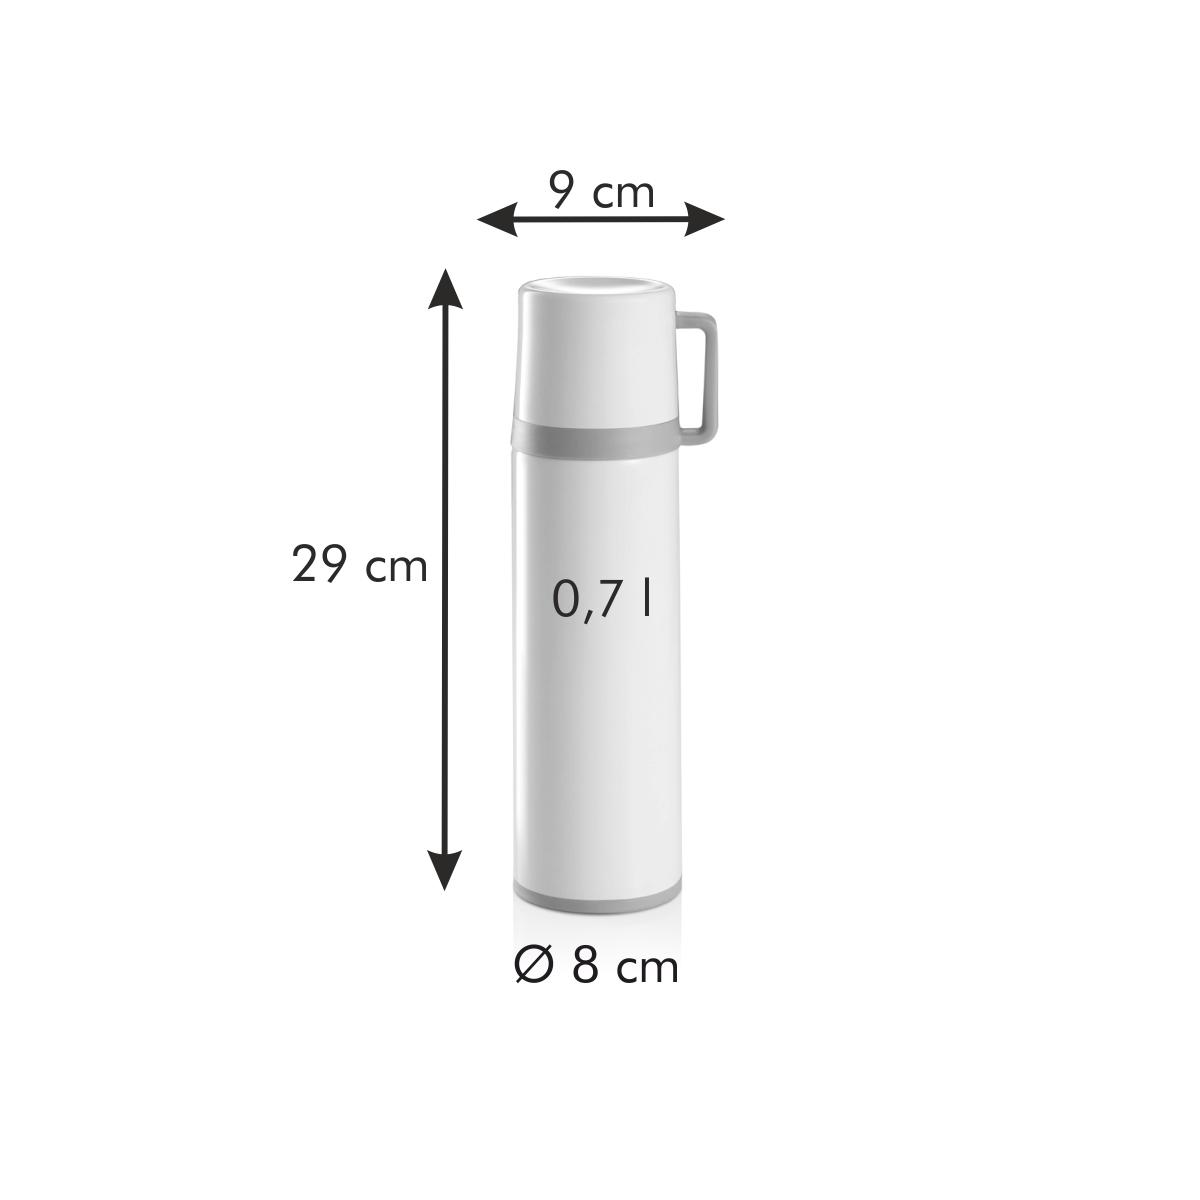 Termoska s hrníčkem CONSTANT CREAM 0,7 l, nerez